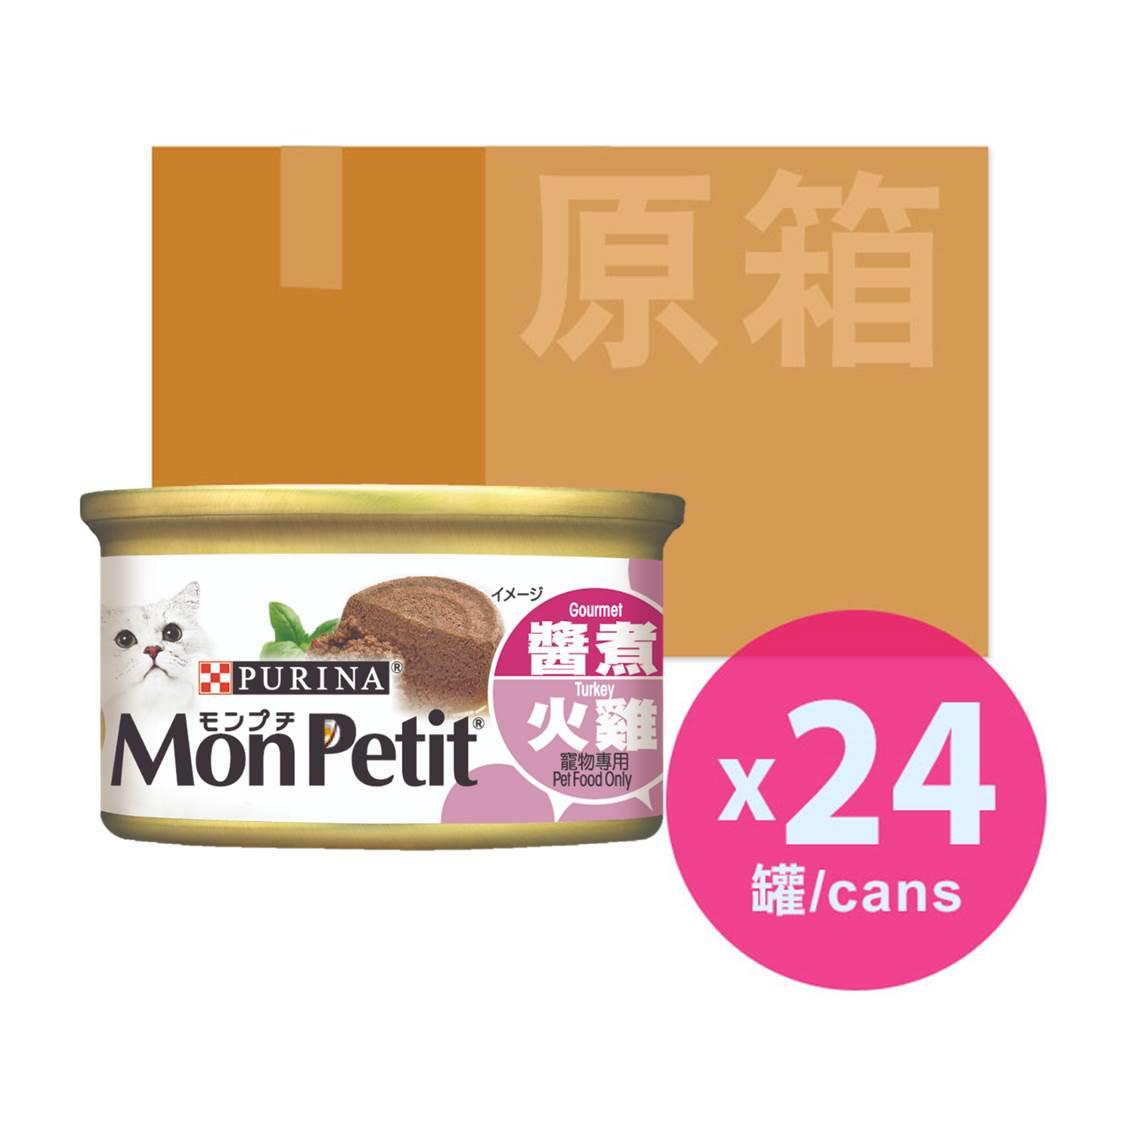 MON PETIT原箱至尊醬煮火雞24X85G